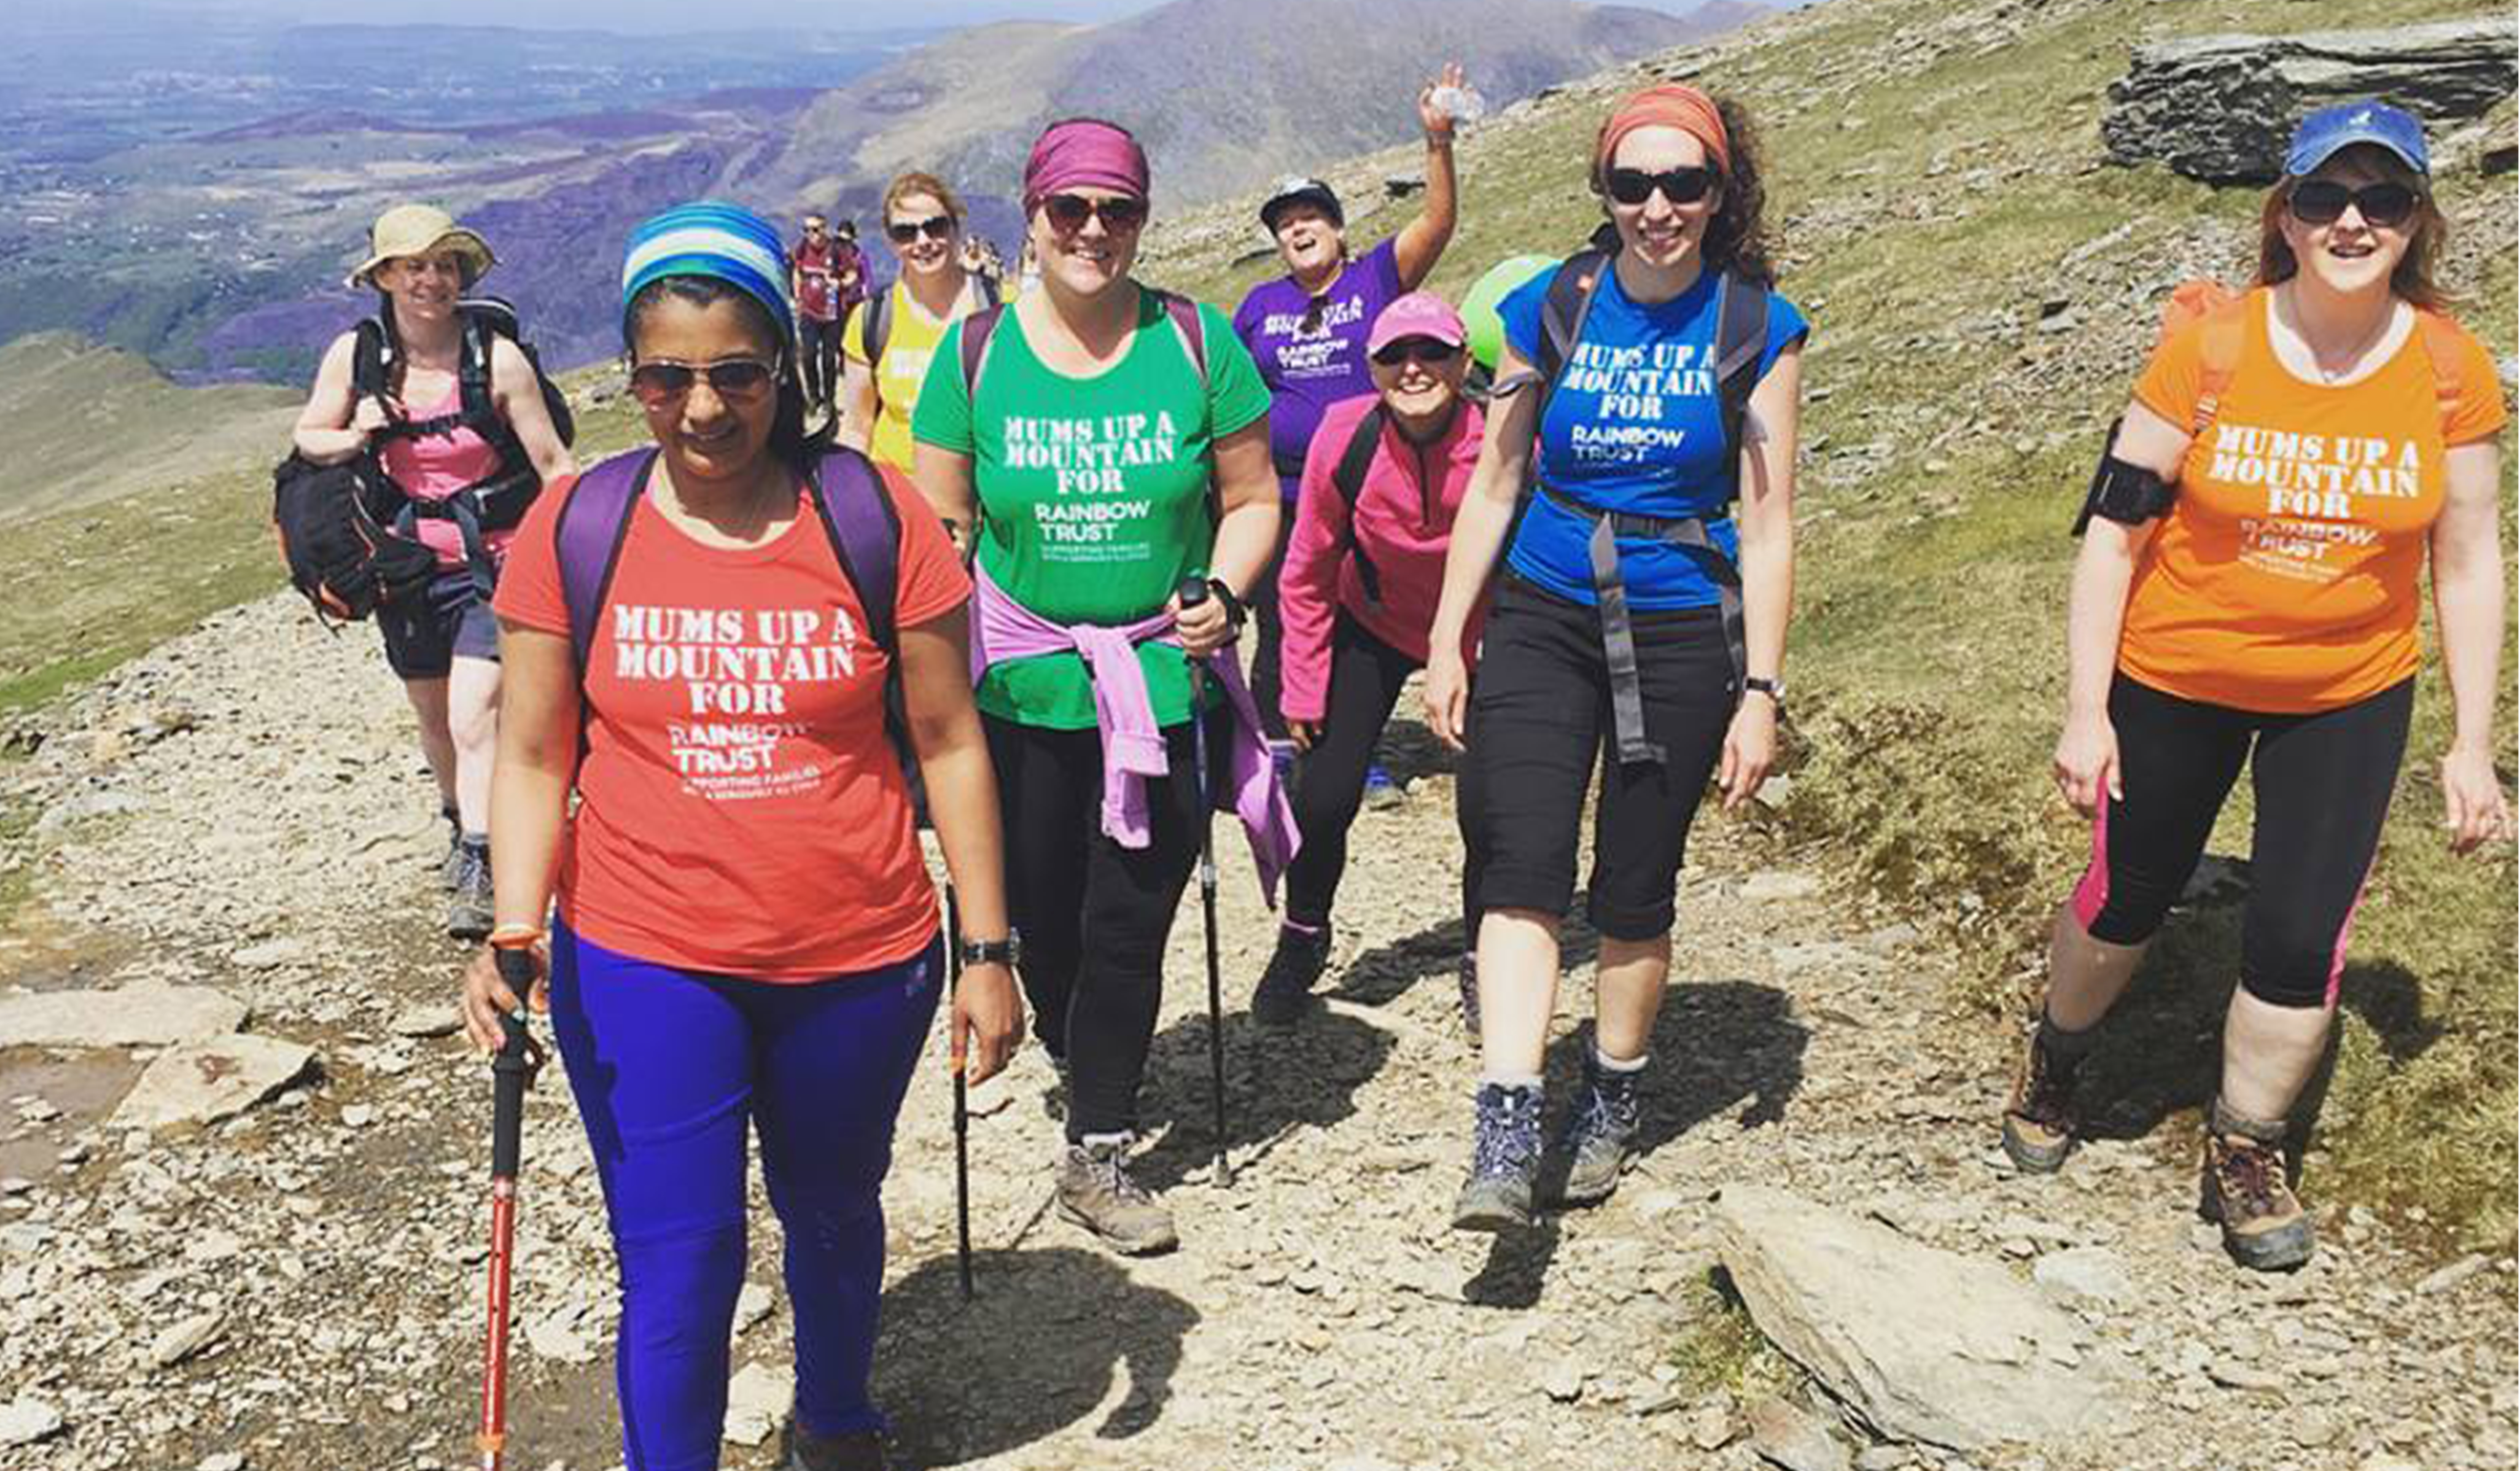 Mums up a Mountain conquer Mount Snowdon